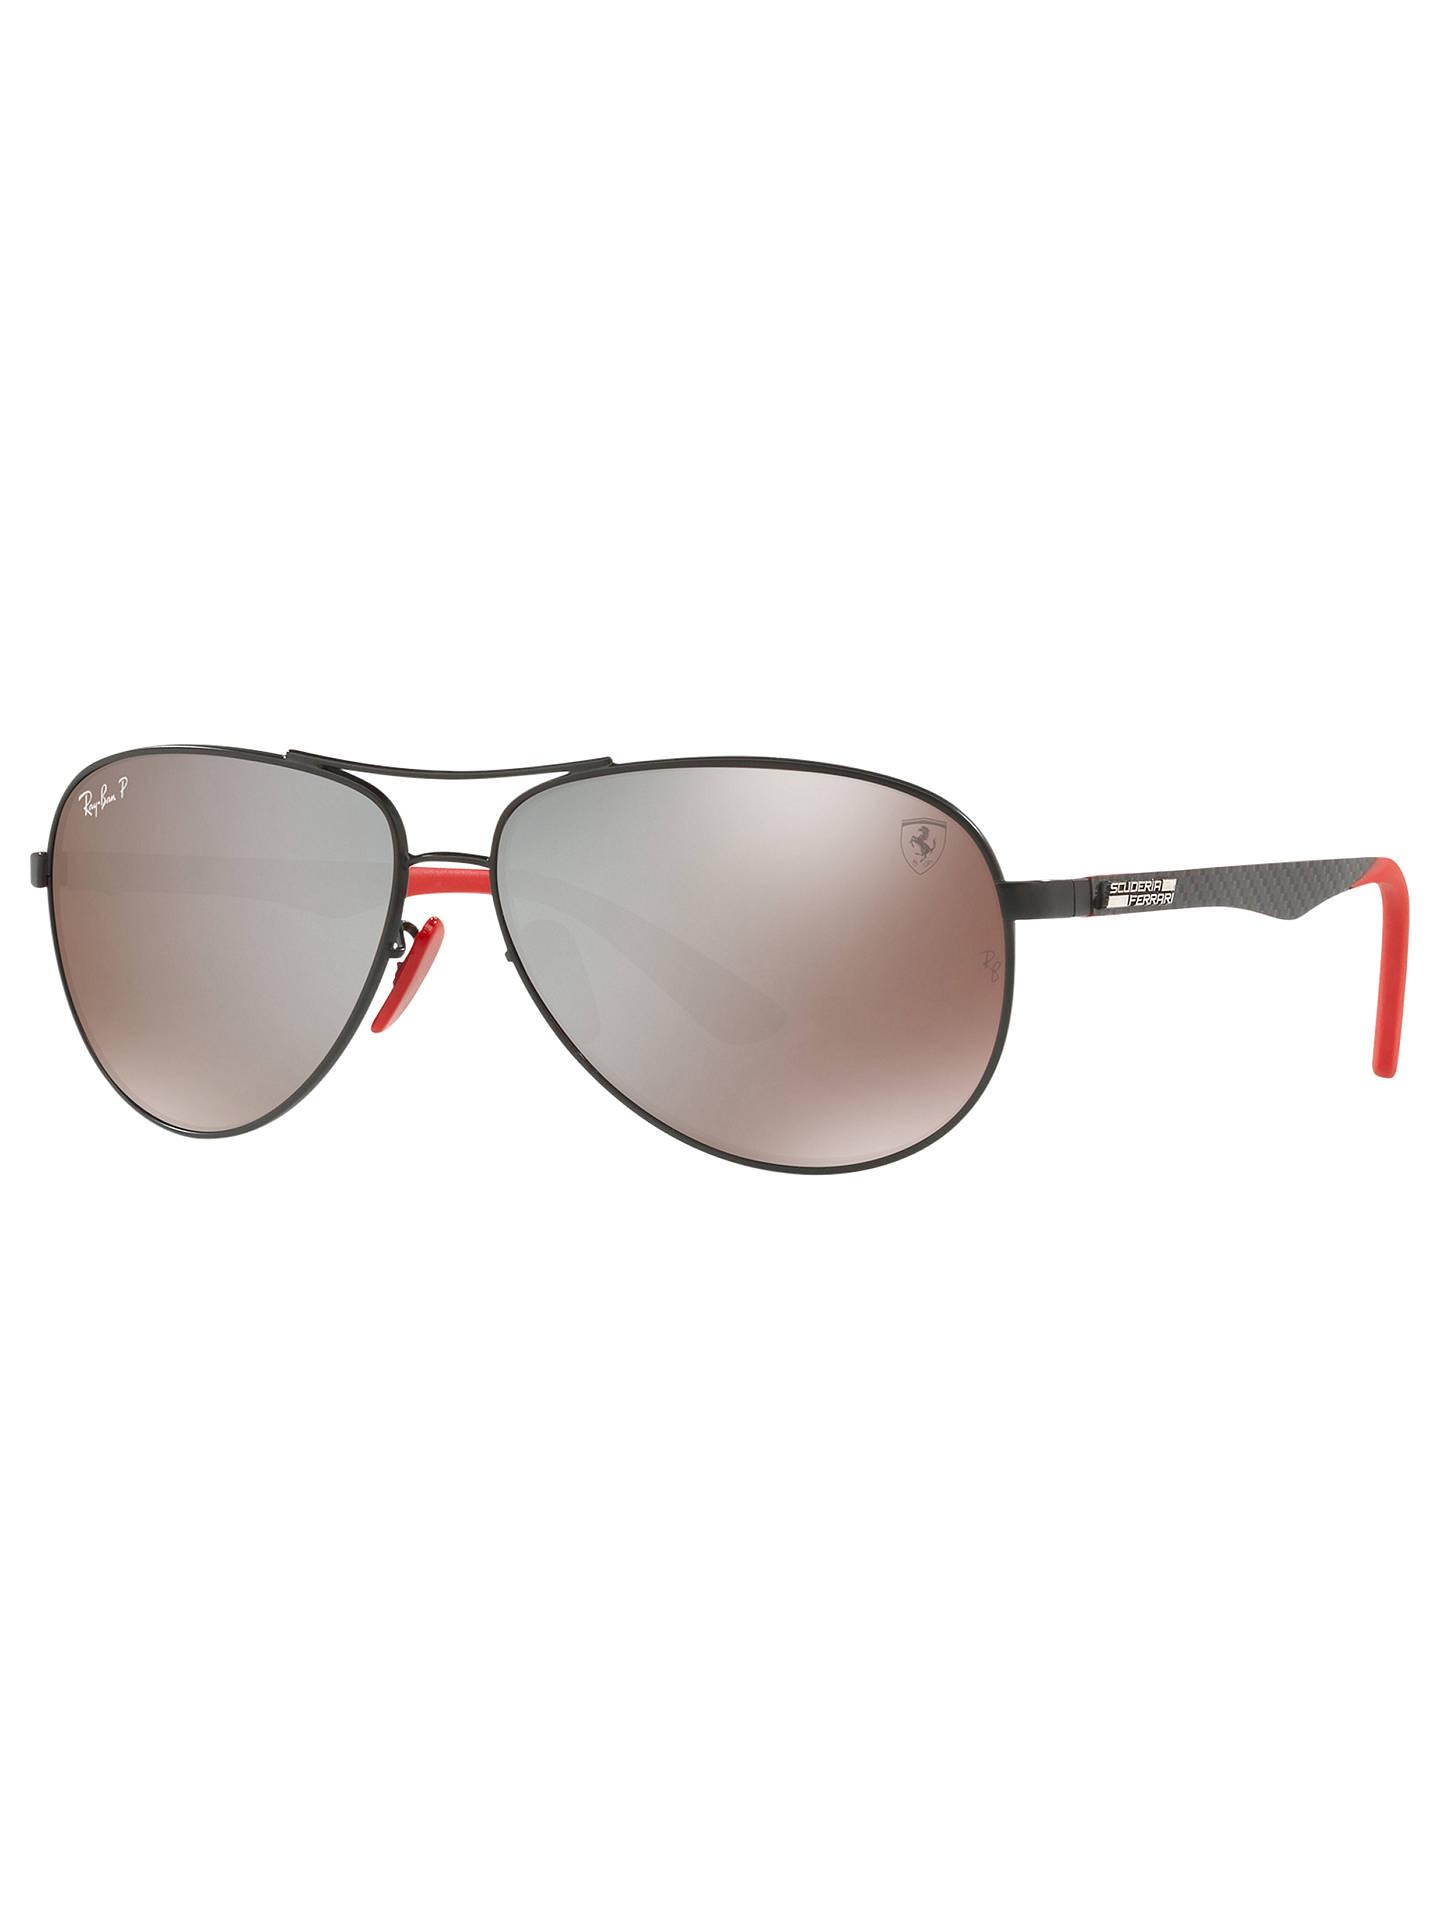 8d061eb75646 Ray-Ban RB8313M Polarised Scuderia Ferrari Aviator Sunglasses at ...